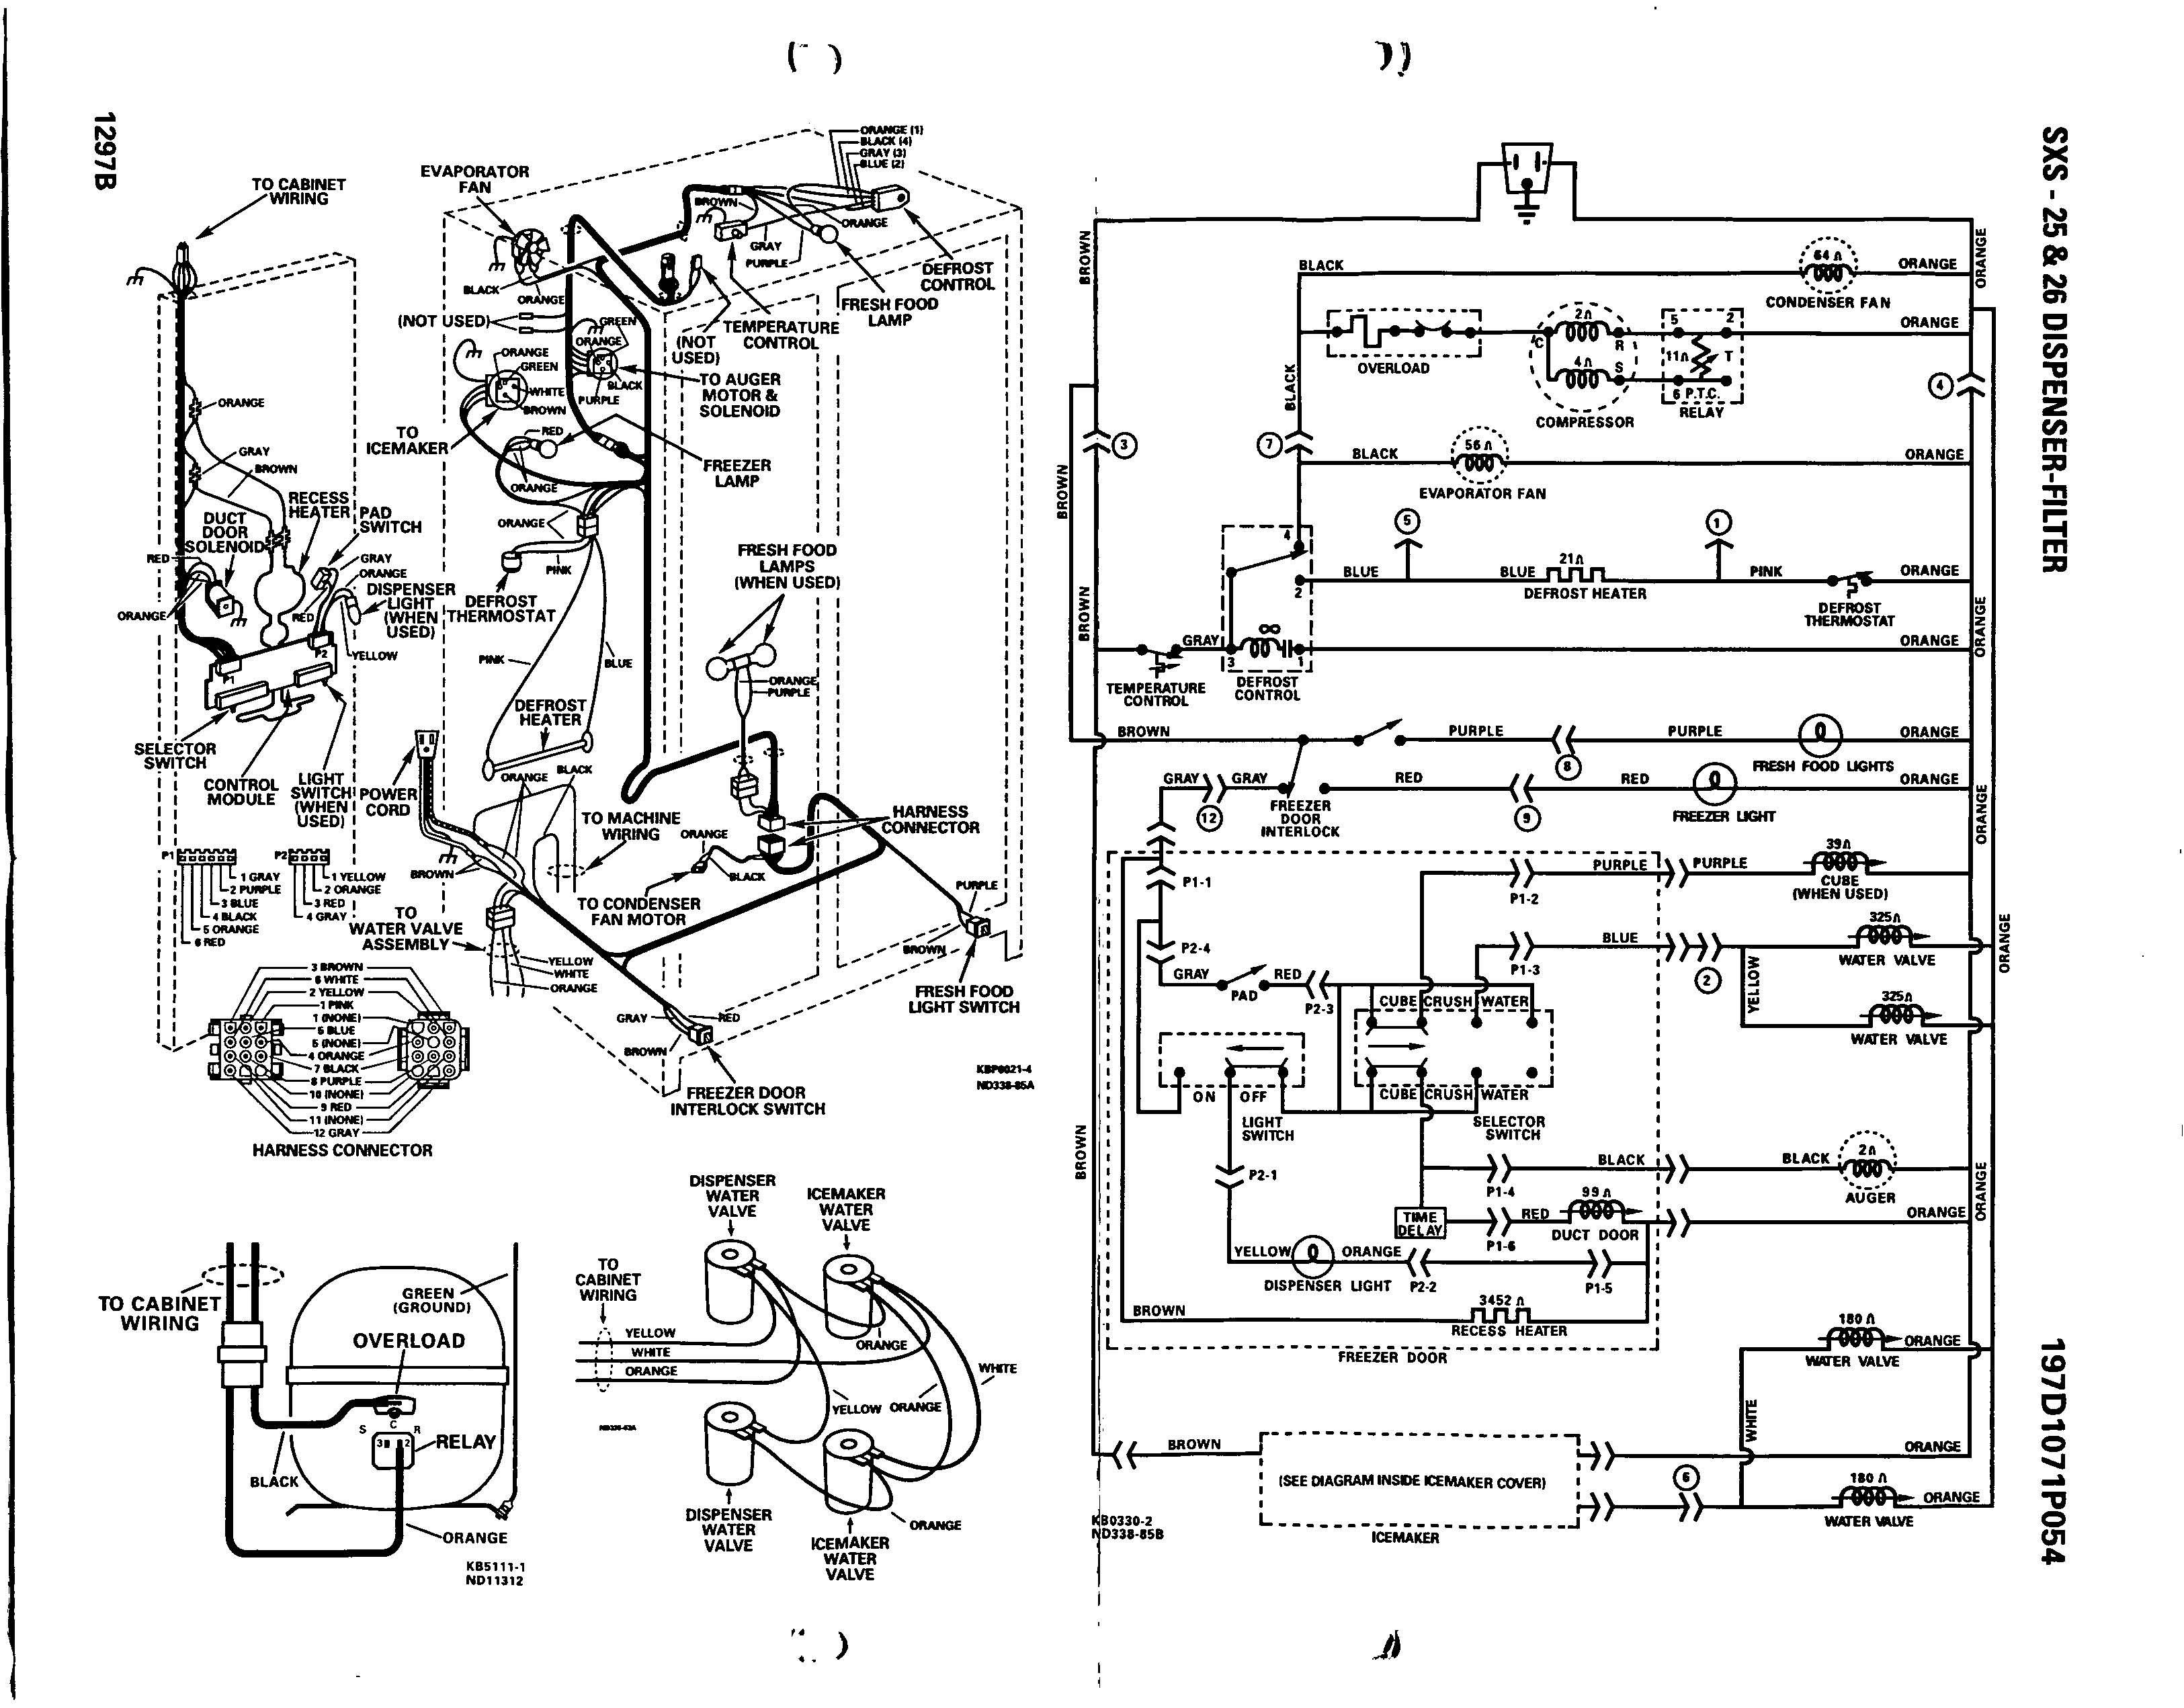 New Ge Dimmer Switch Wiring Diagram Diagram Diagramtemplate Diagramsample Lavadora Whirlpool Frases De Educacion Lavadora